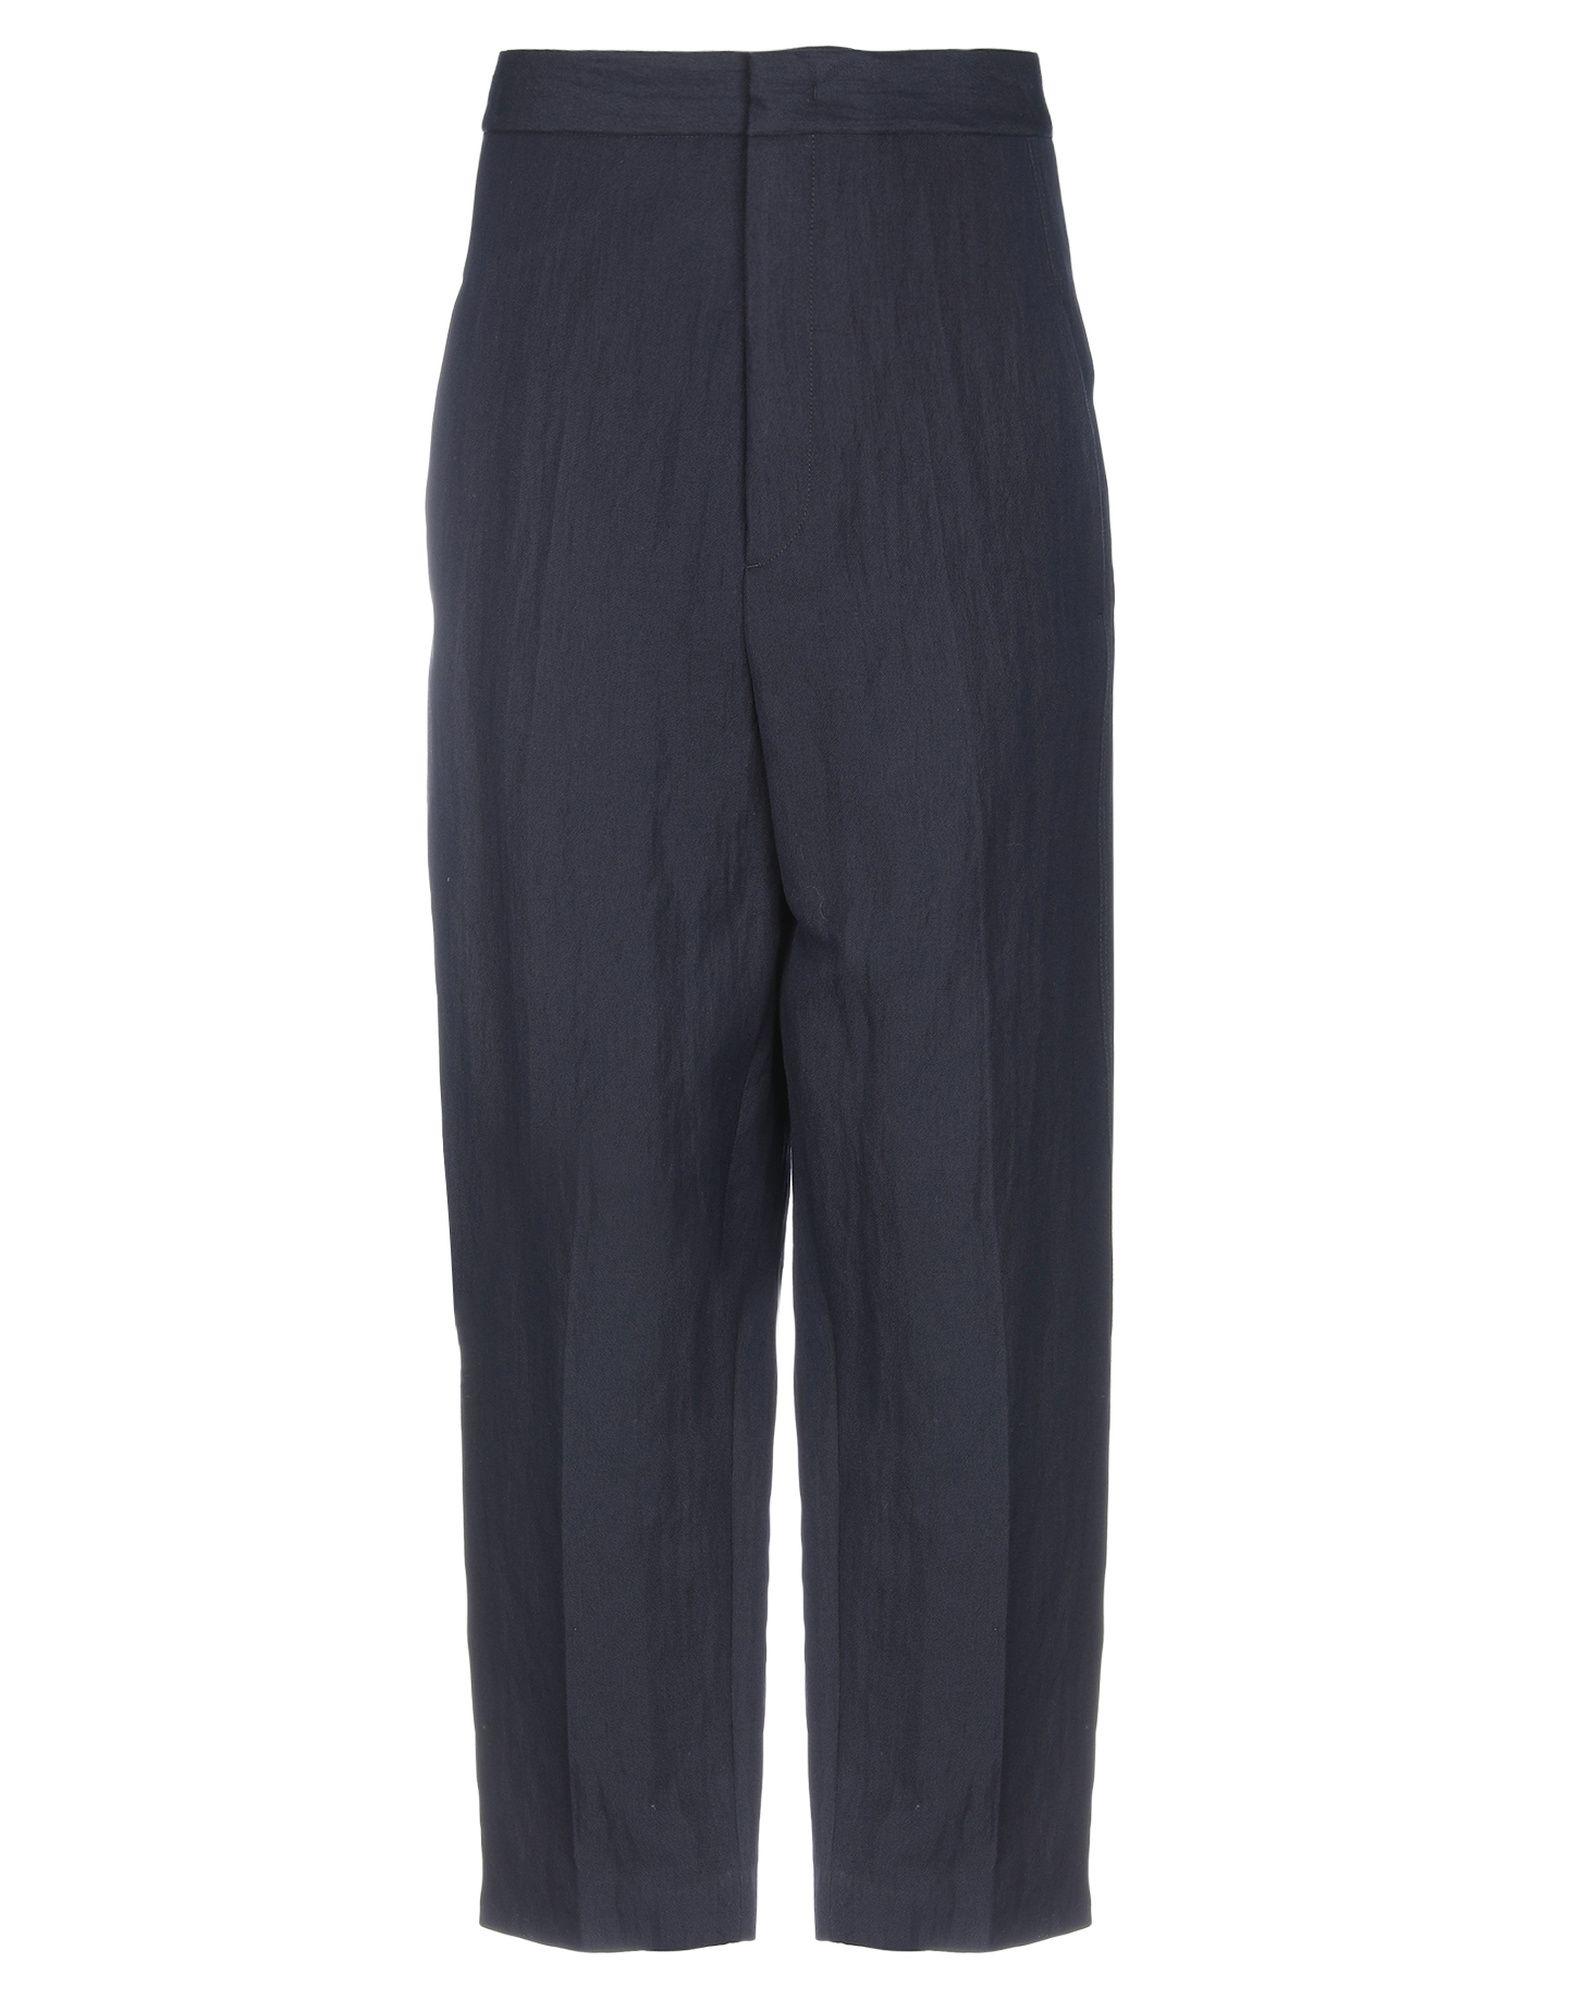 Pantalone Jil Sander herren - 13324828UK